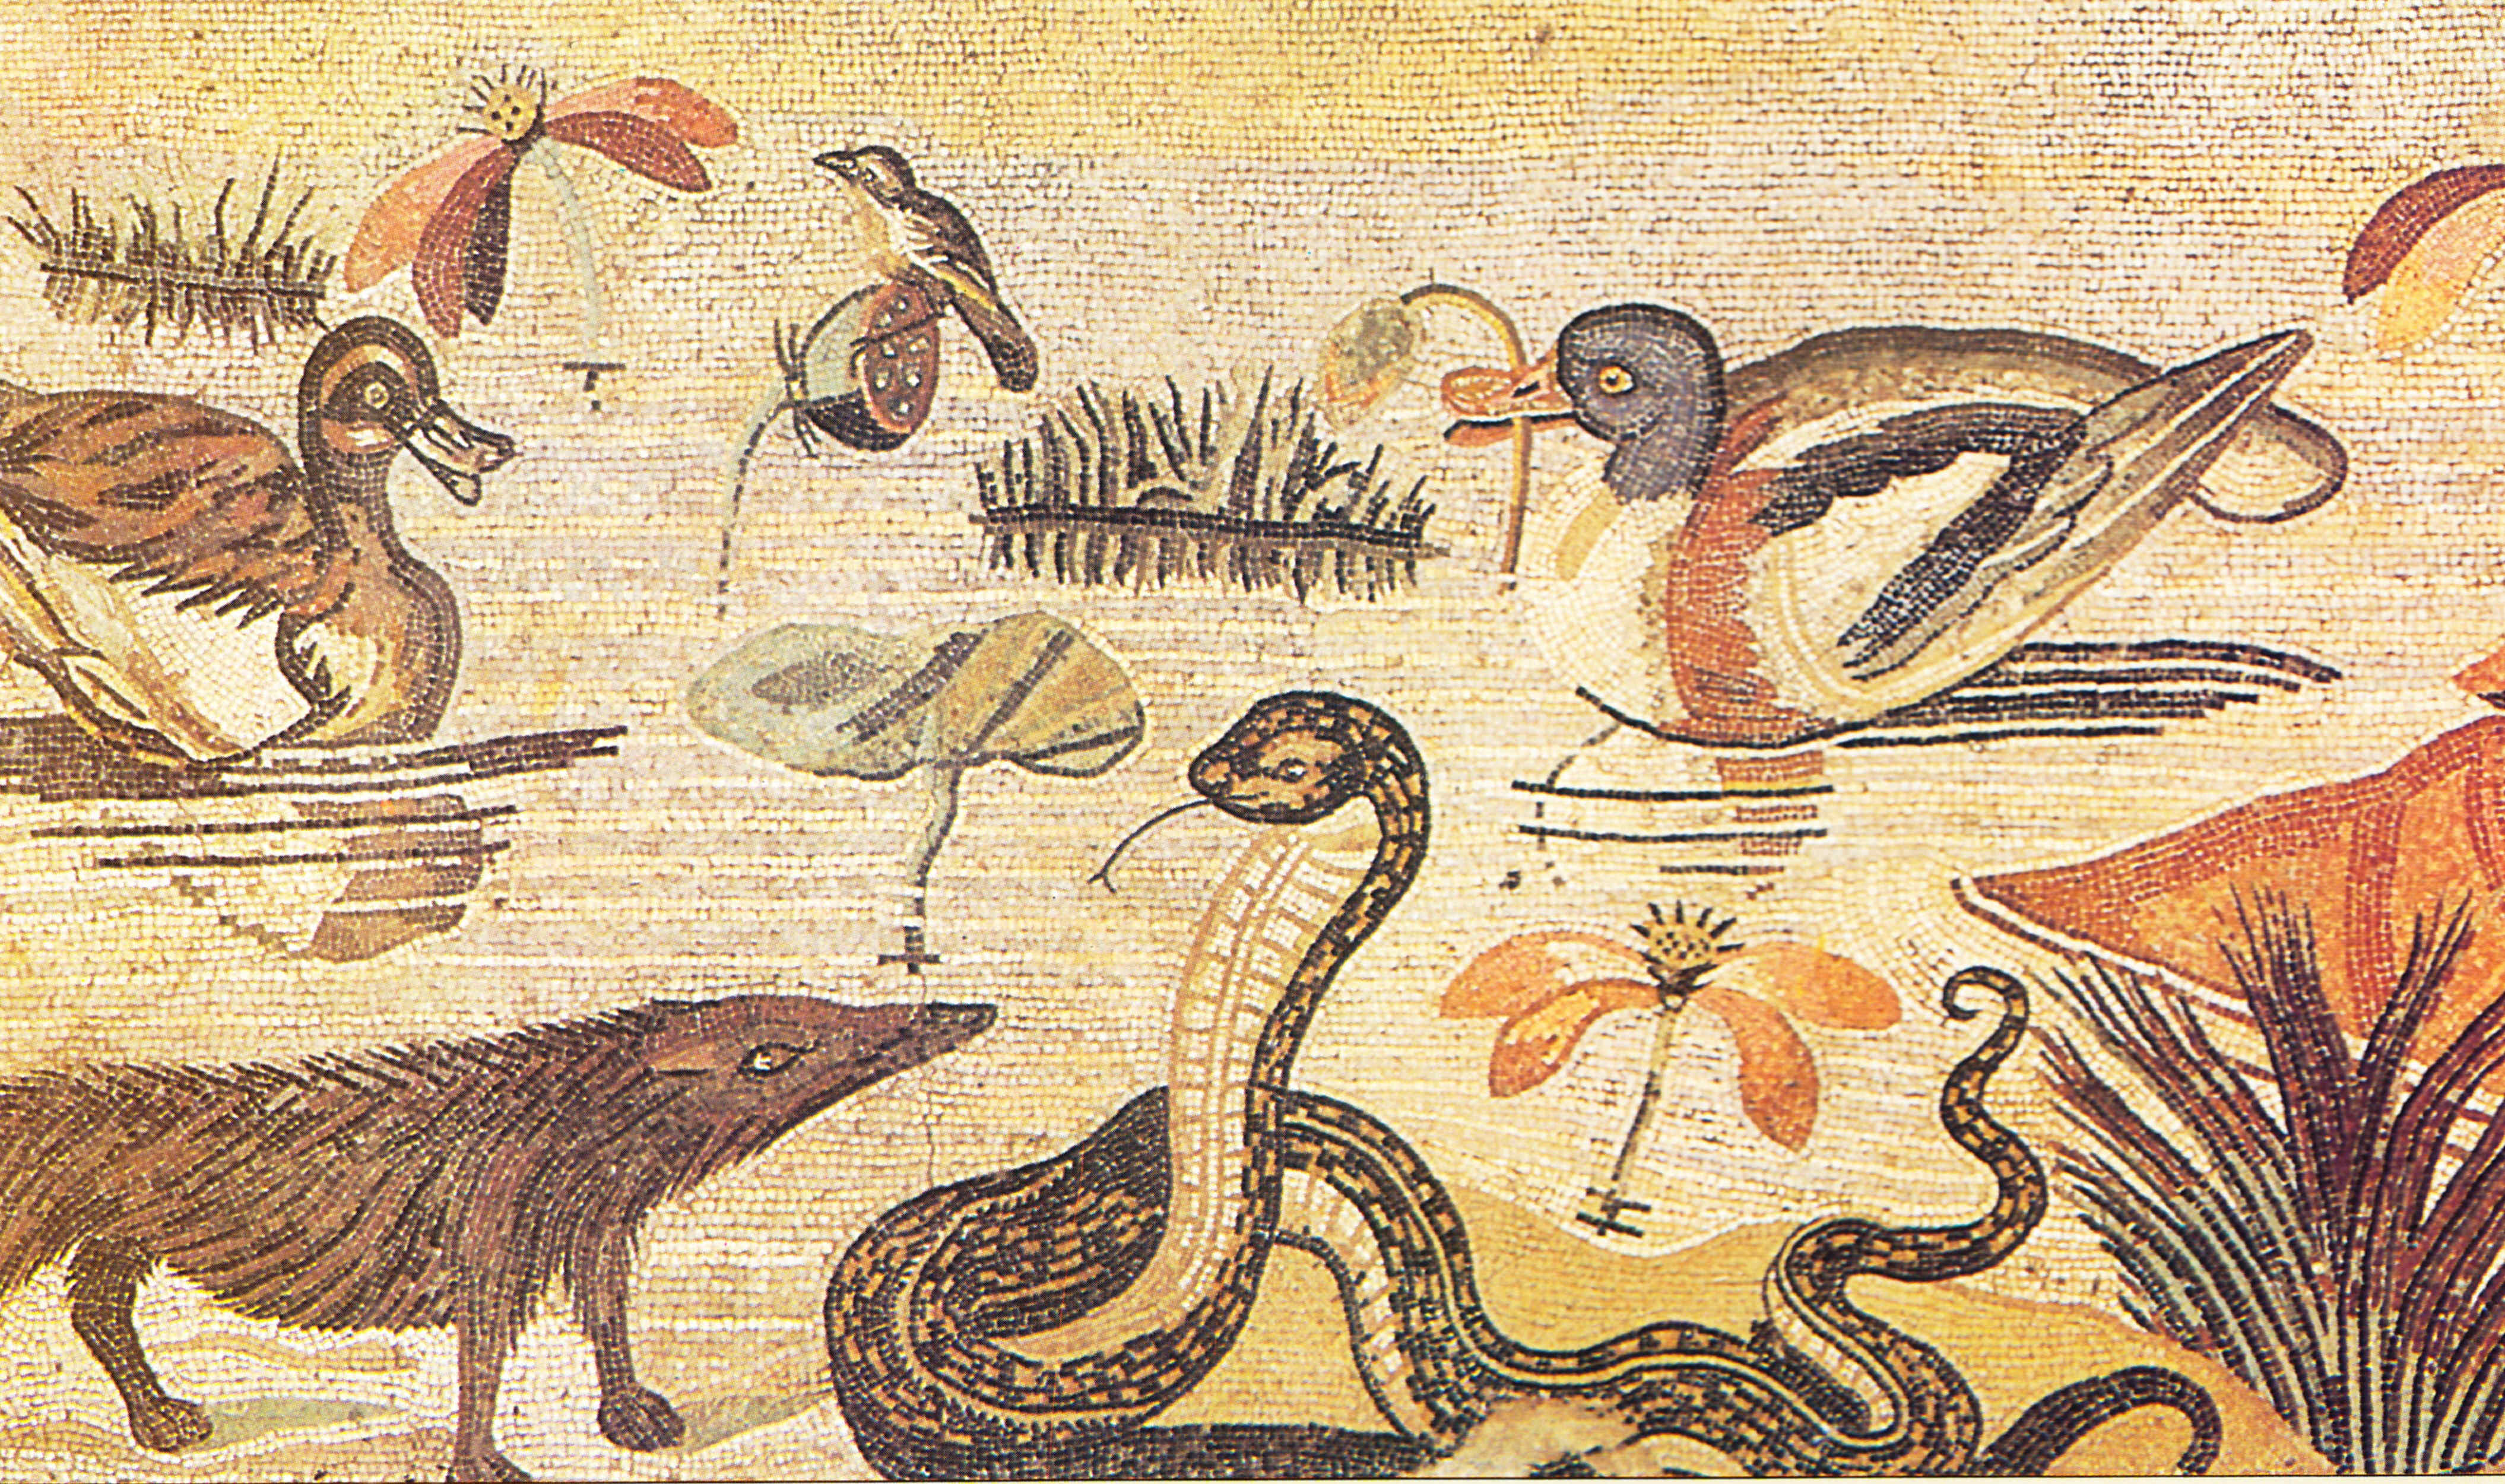 Egipto Antiguo 61 y Ptolomeo XII 4